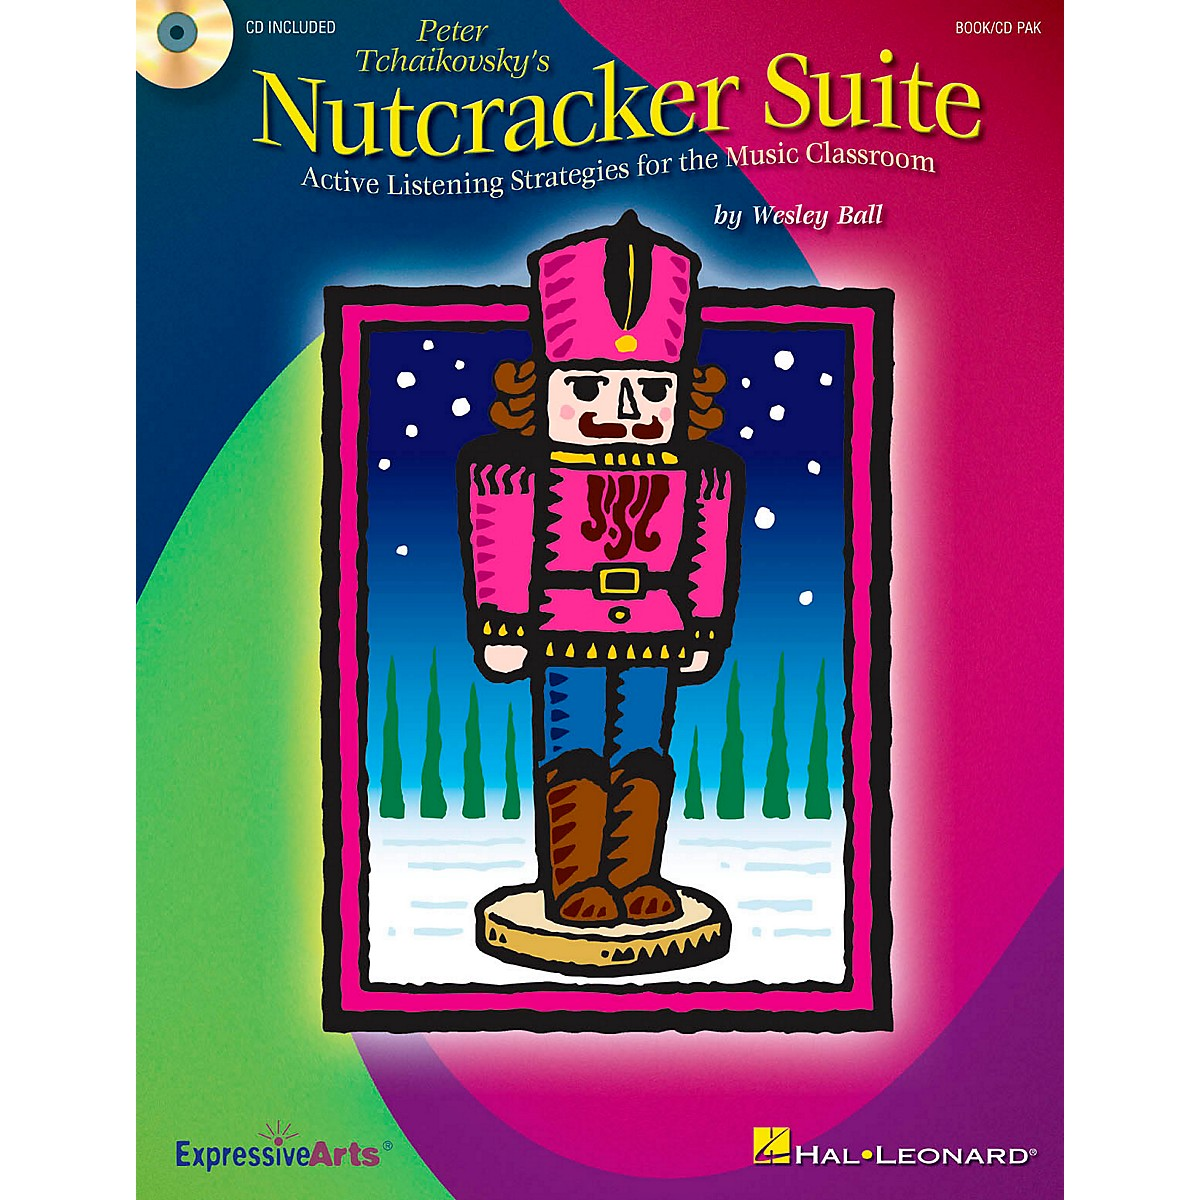 Hal Leonard Nutcracker Suite - Active Listening Strategies for the Music Classroom Activity Book/CD